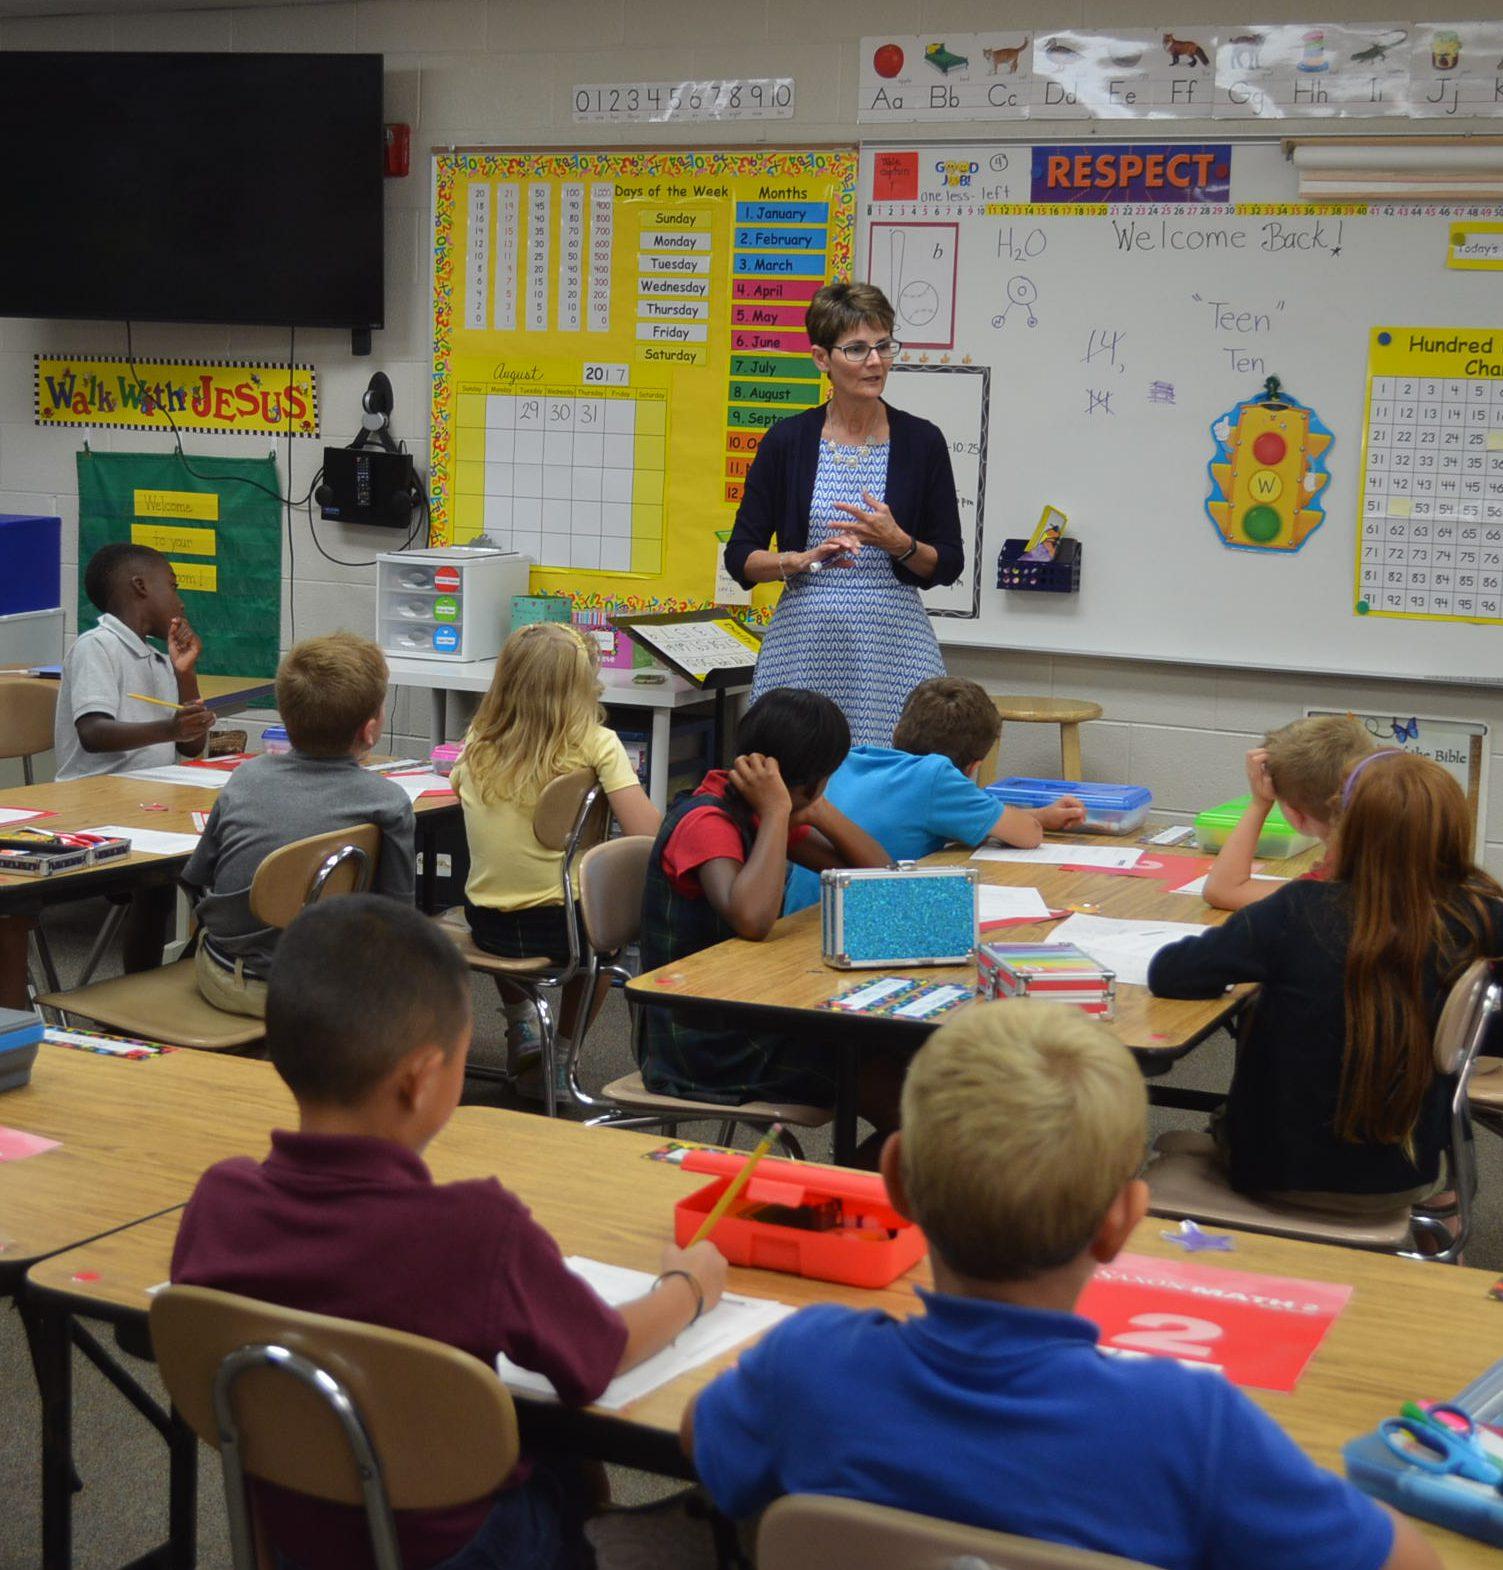 2nd grade classroom